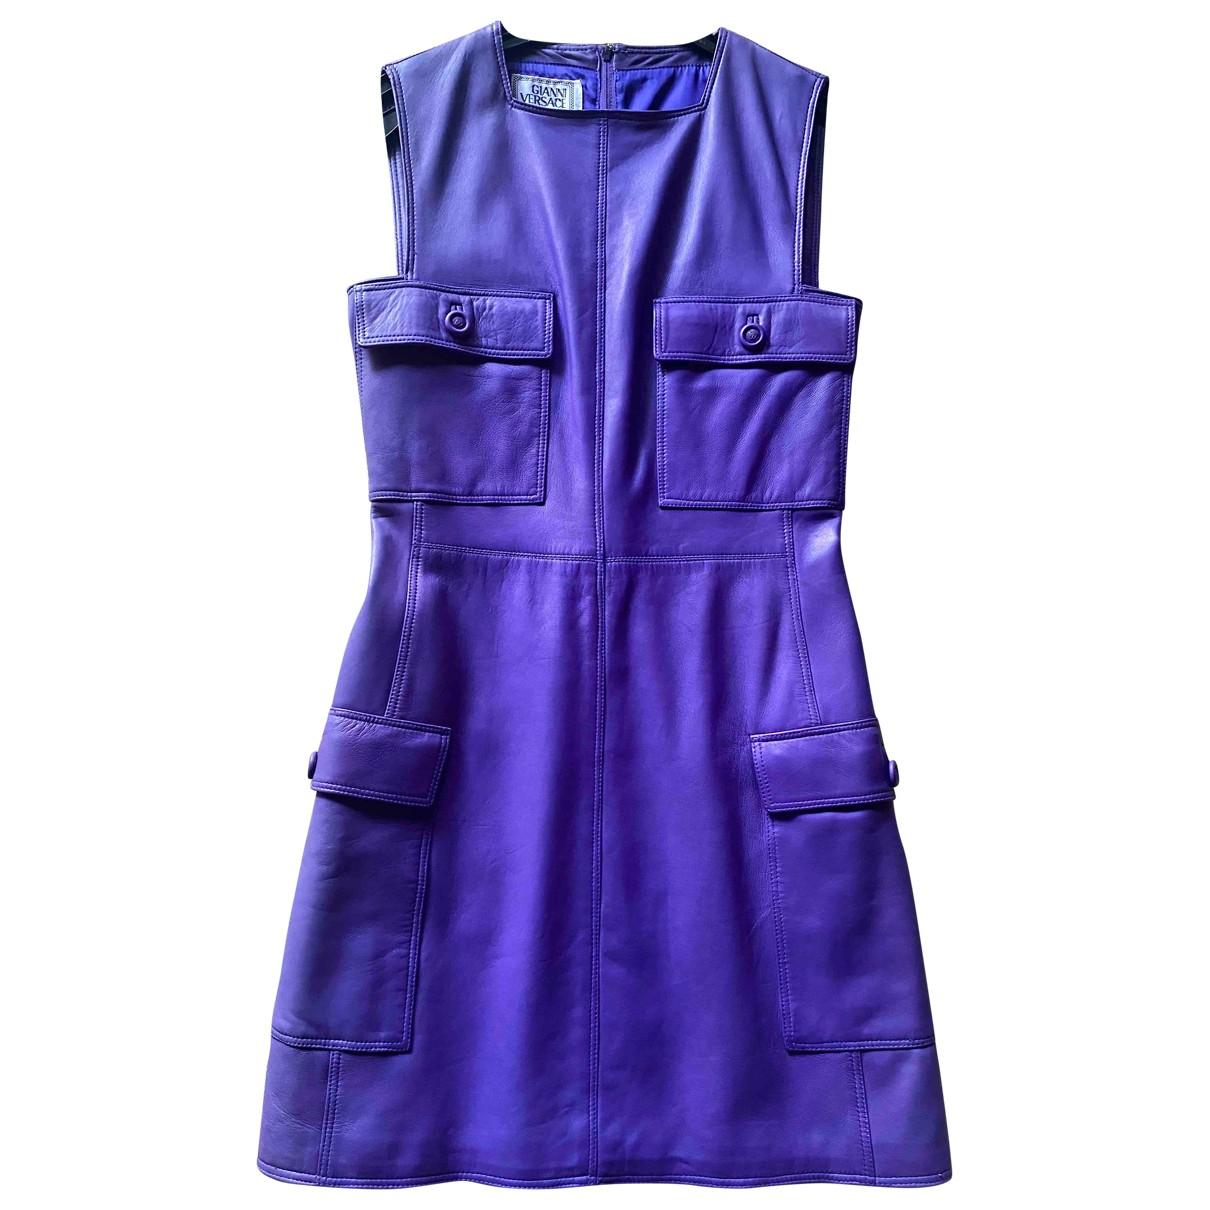 Gianni Versace N Purple Leather Dress for Women